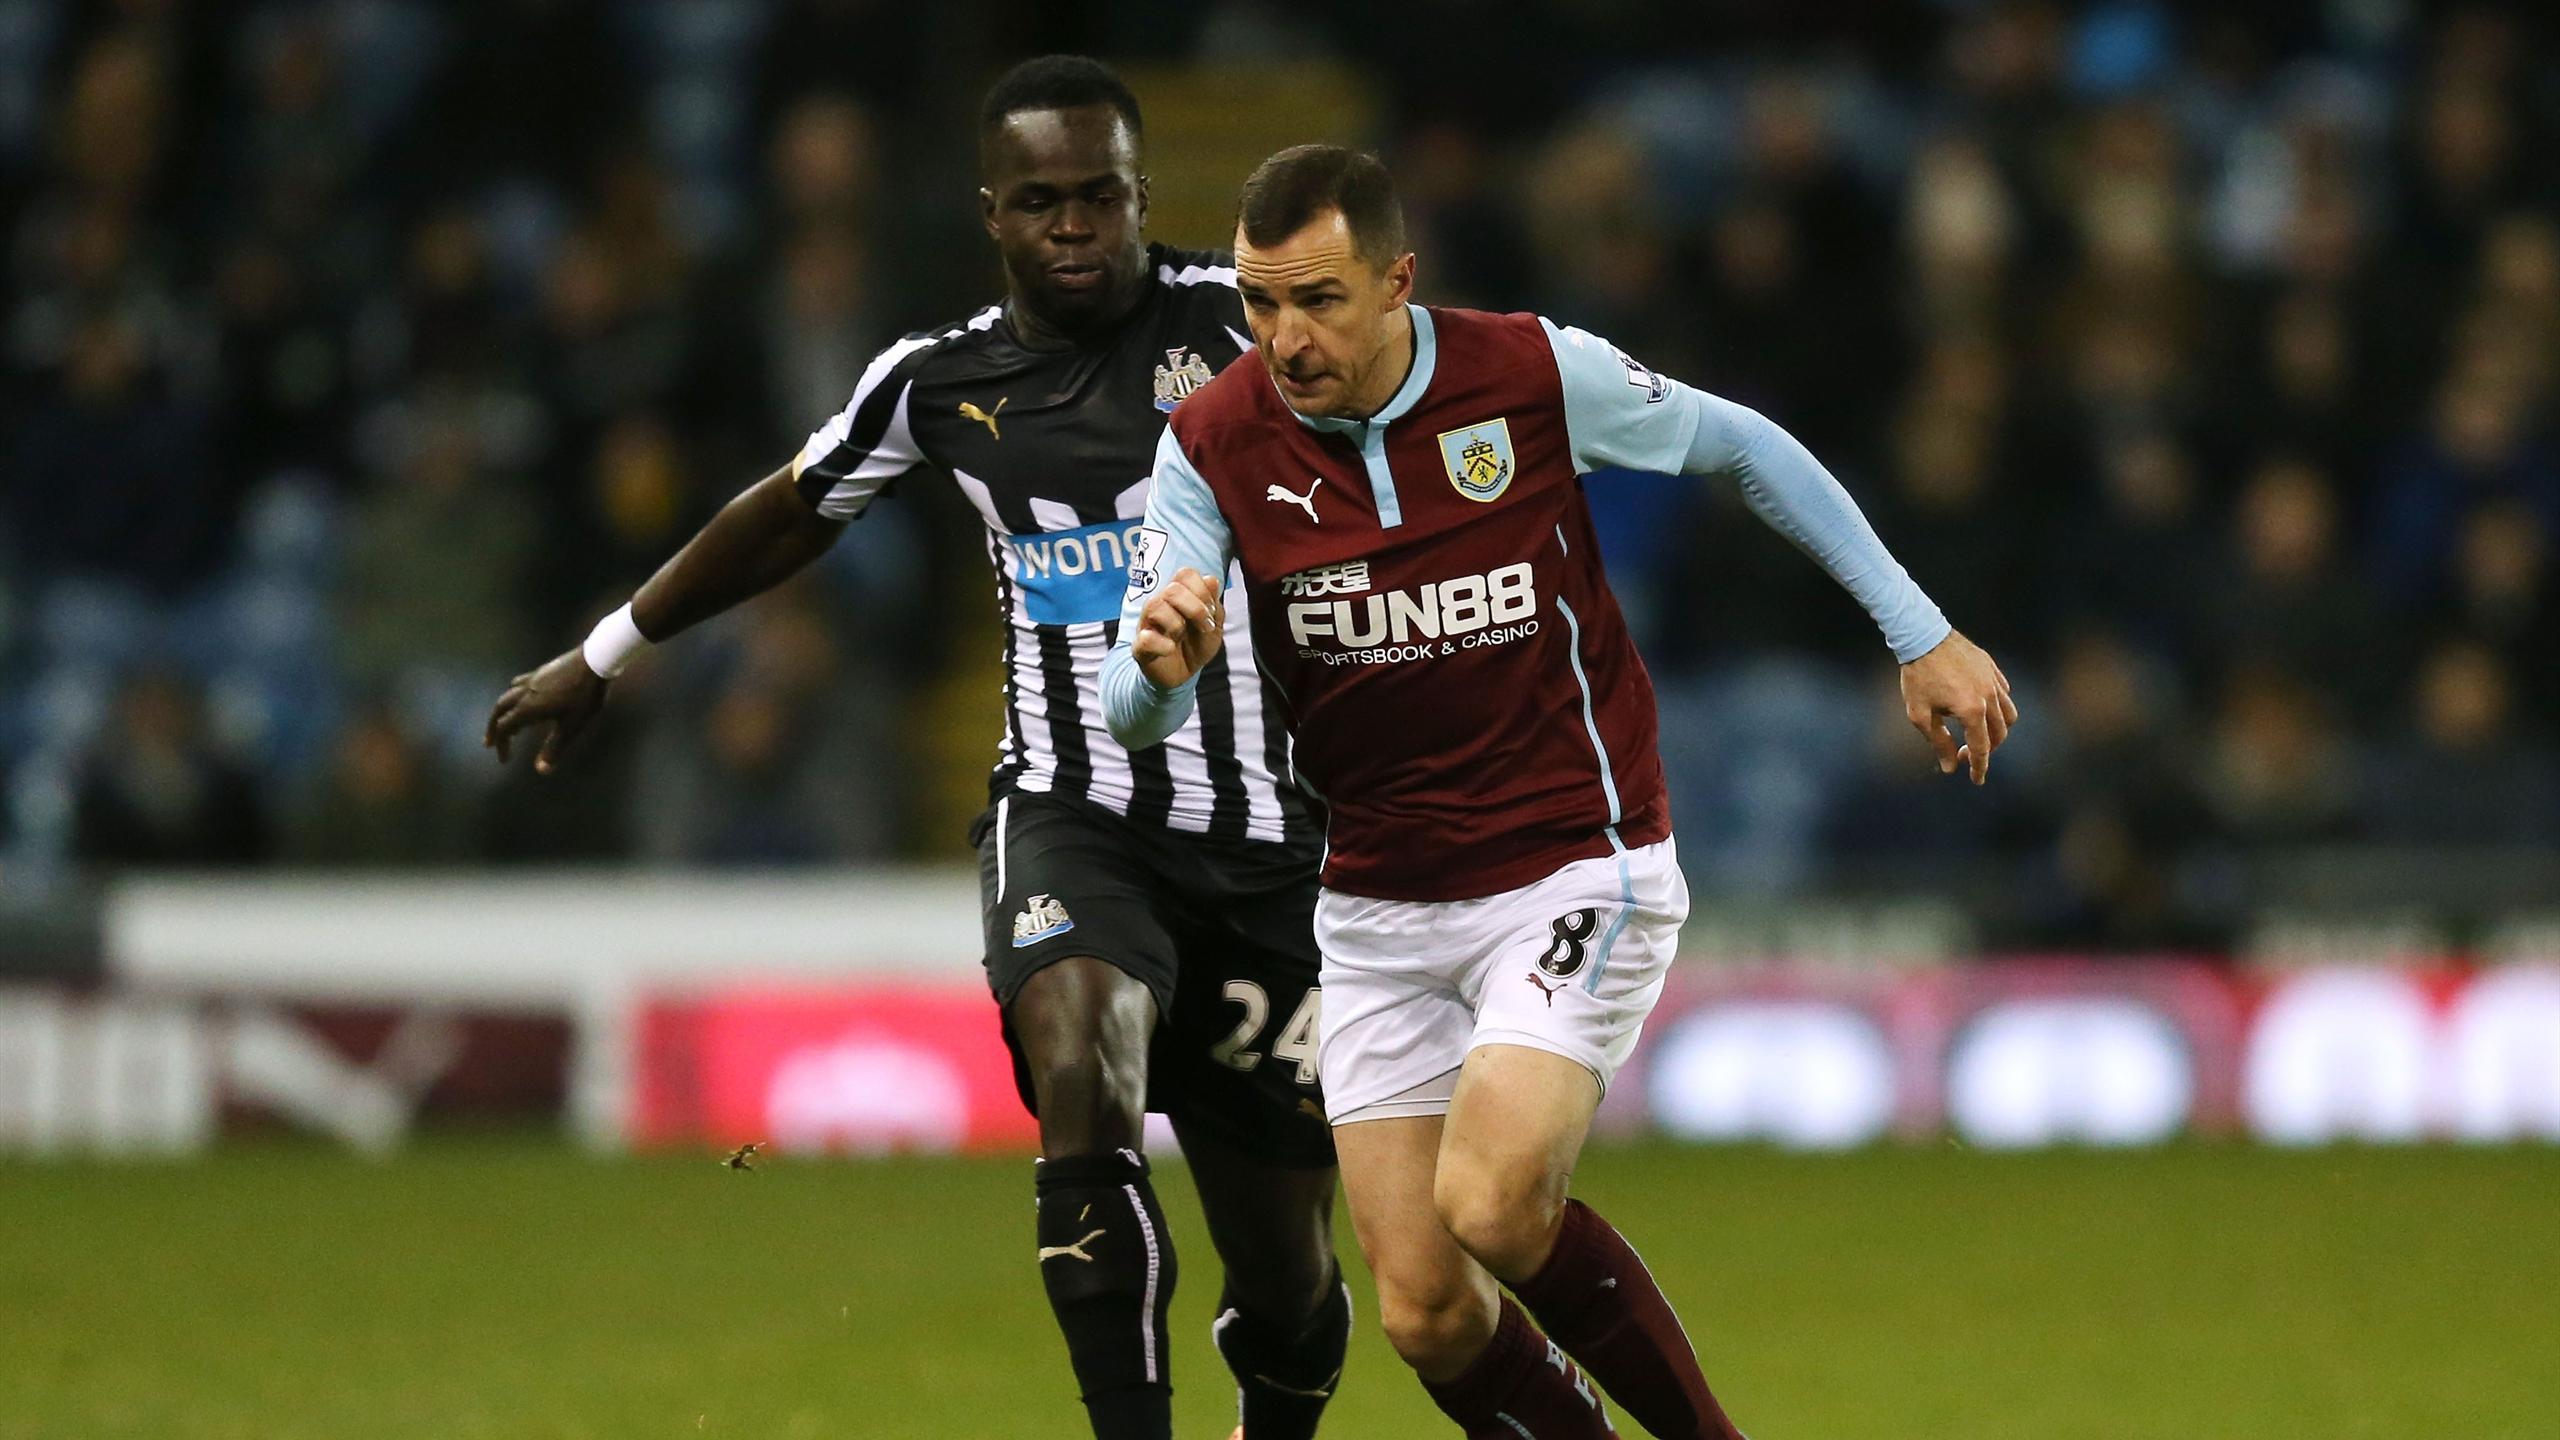 Video: Burnley vs Newcastle United